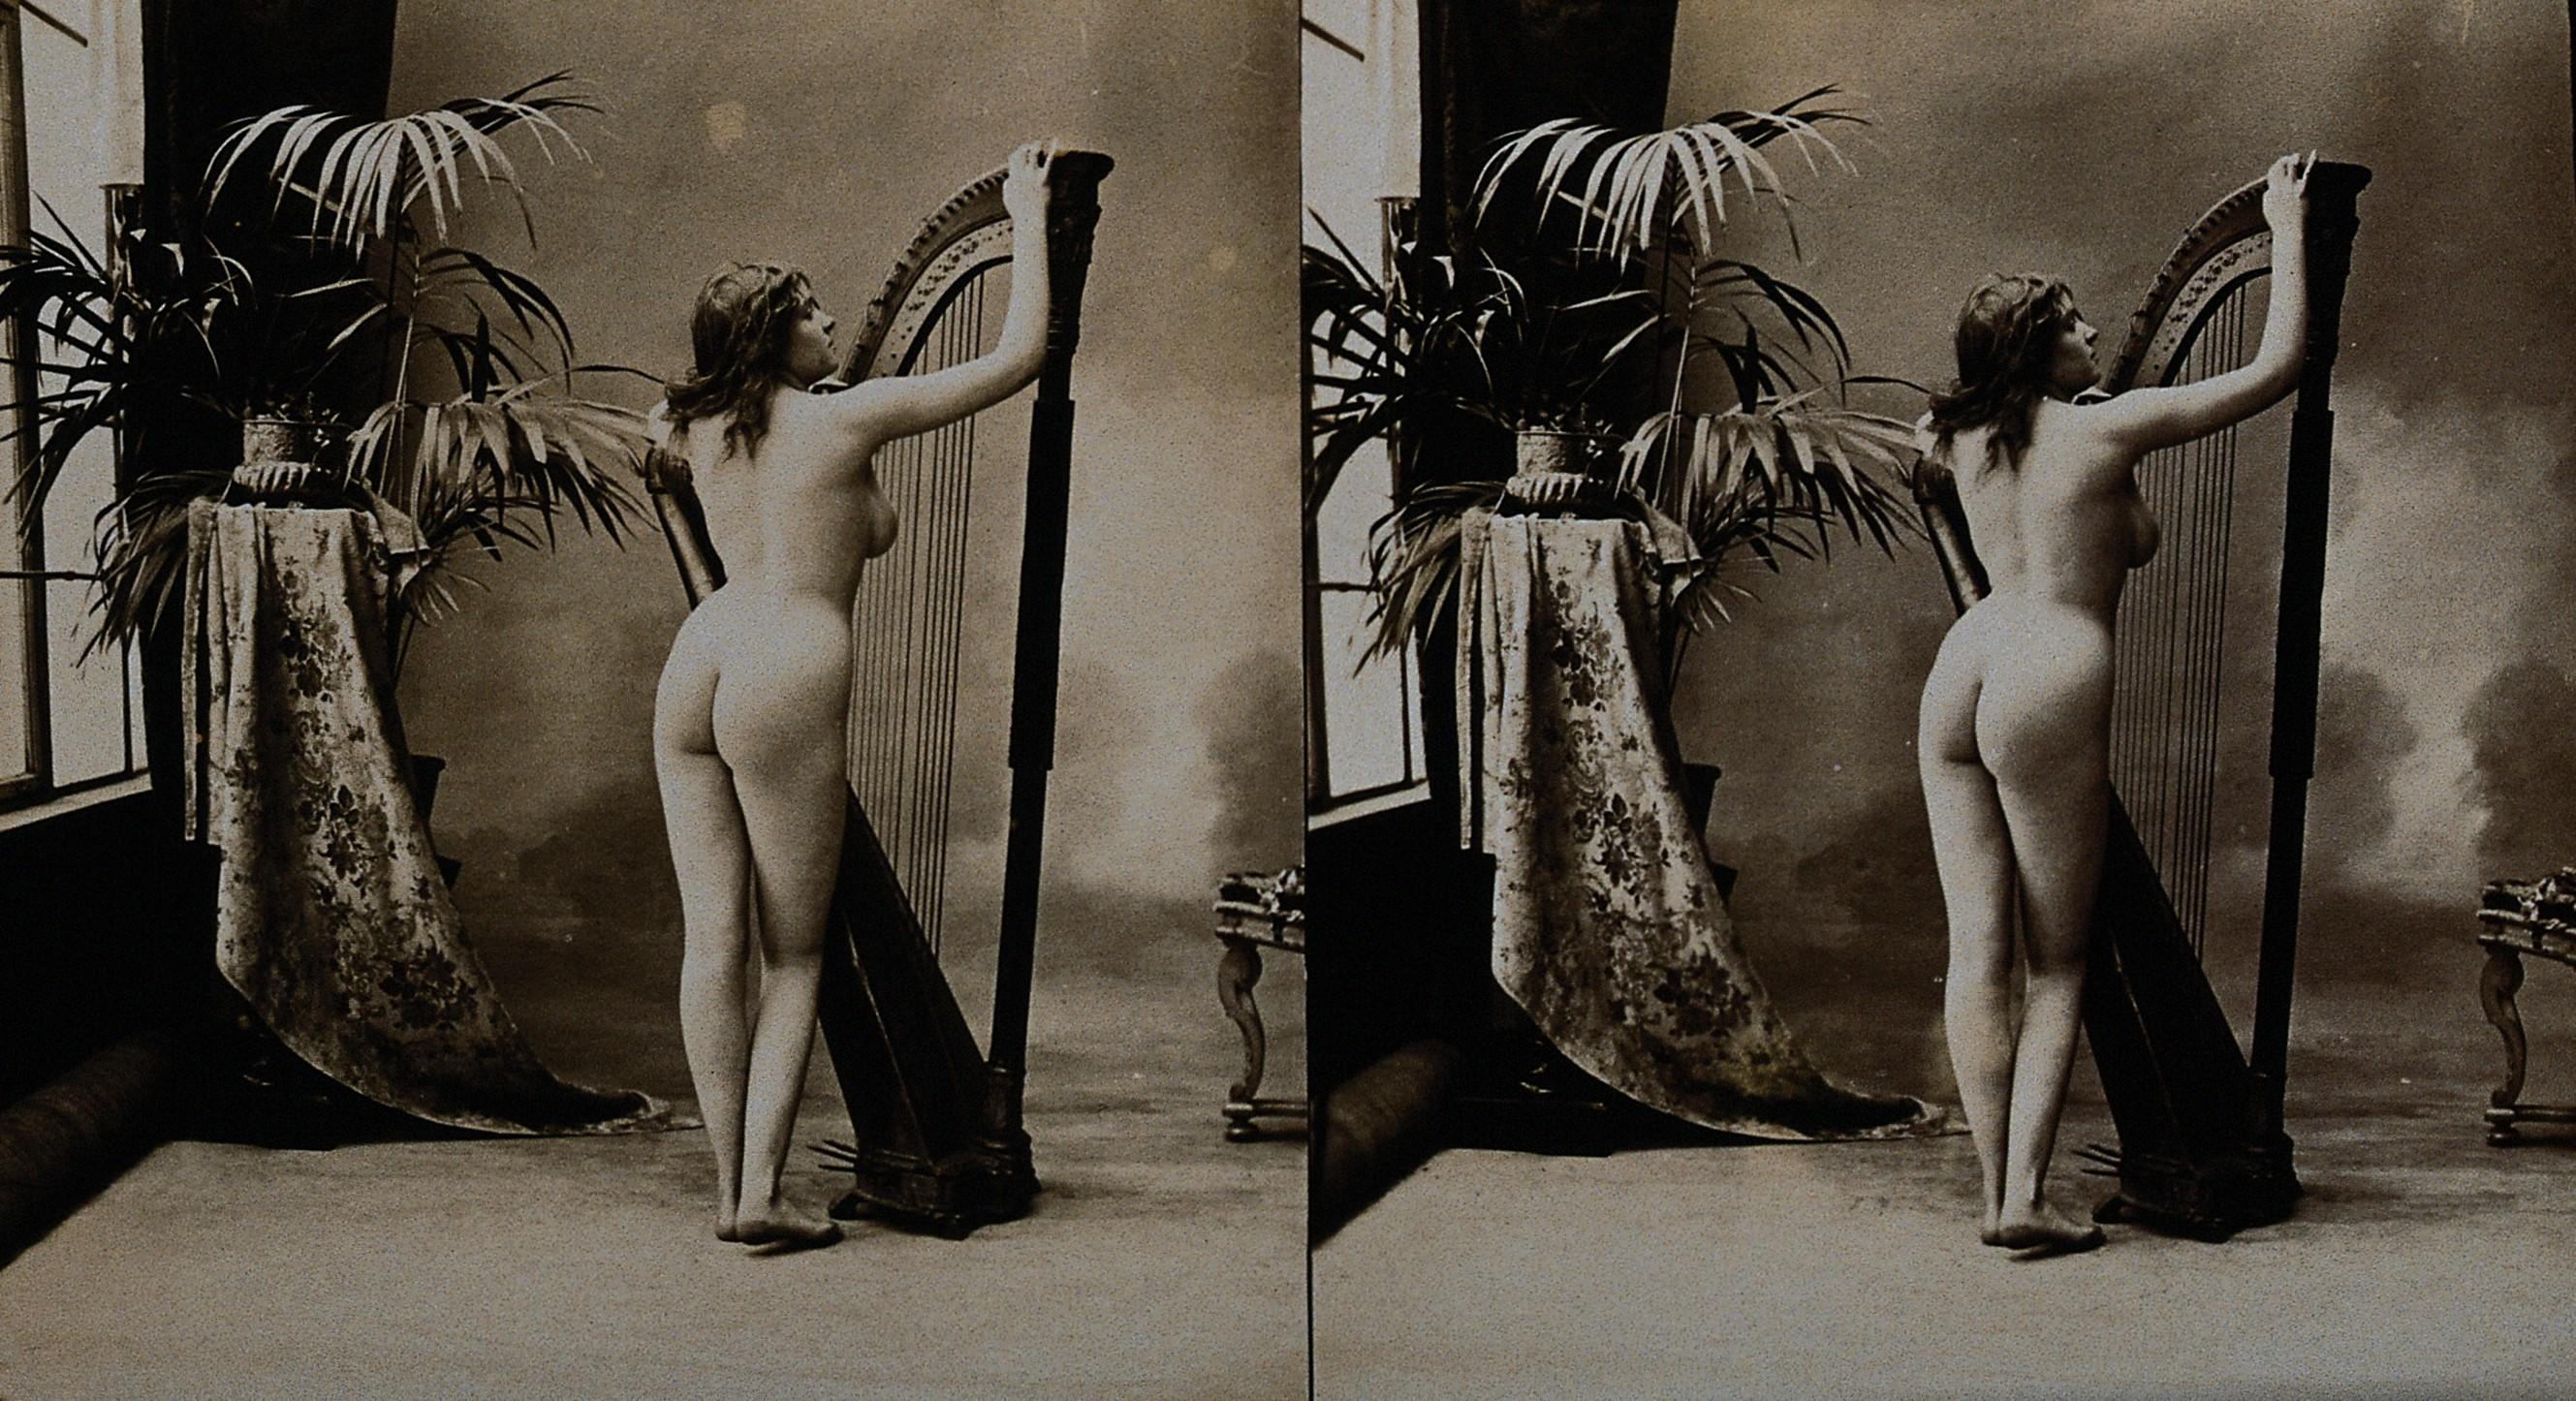 Girl naked cretan women video too young